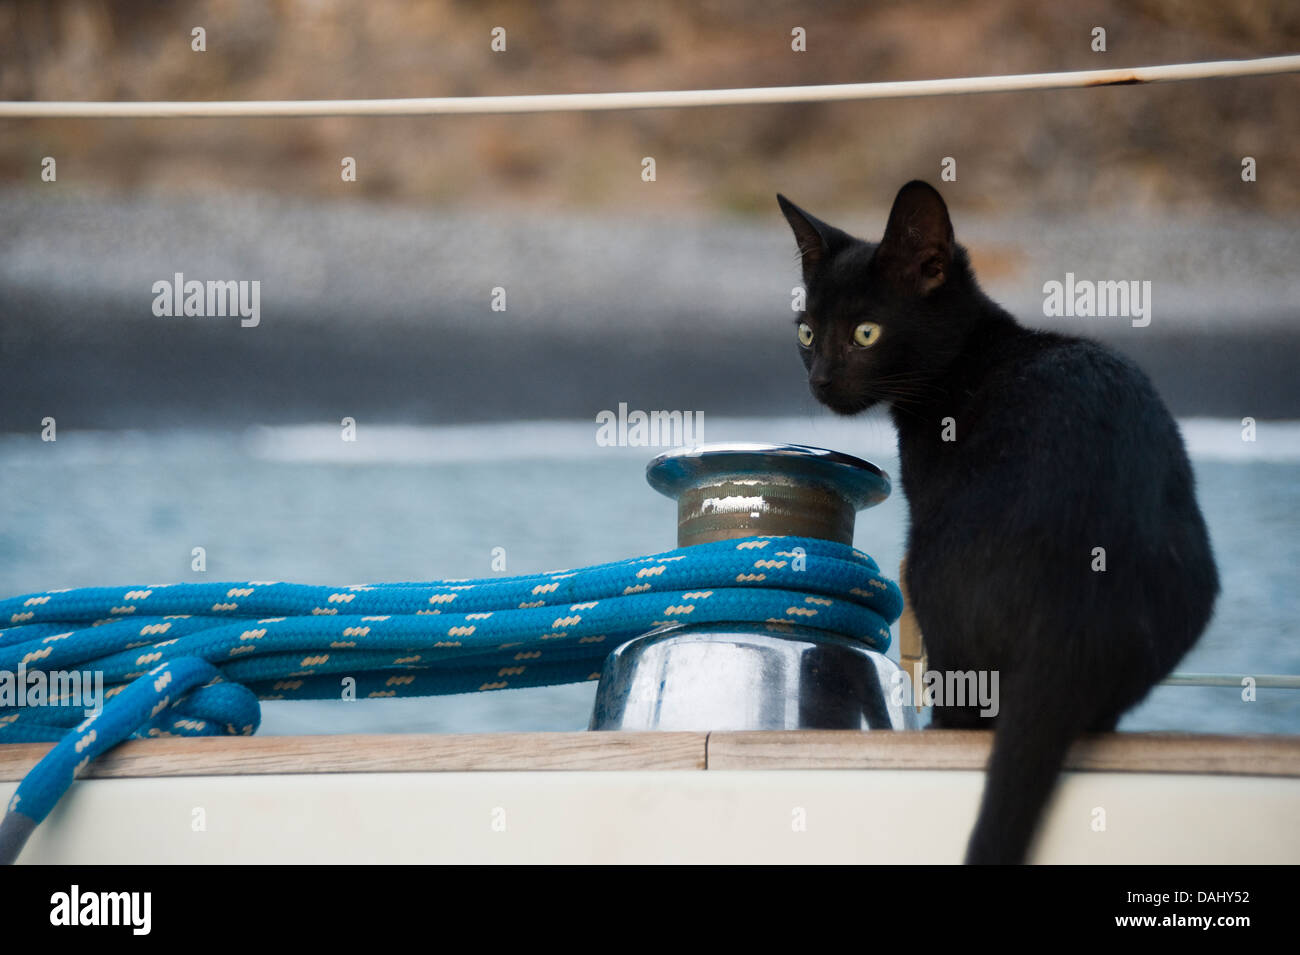 Black cat kitten on yacht looking apprehensive - Stock Image